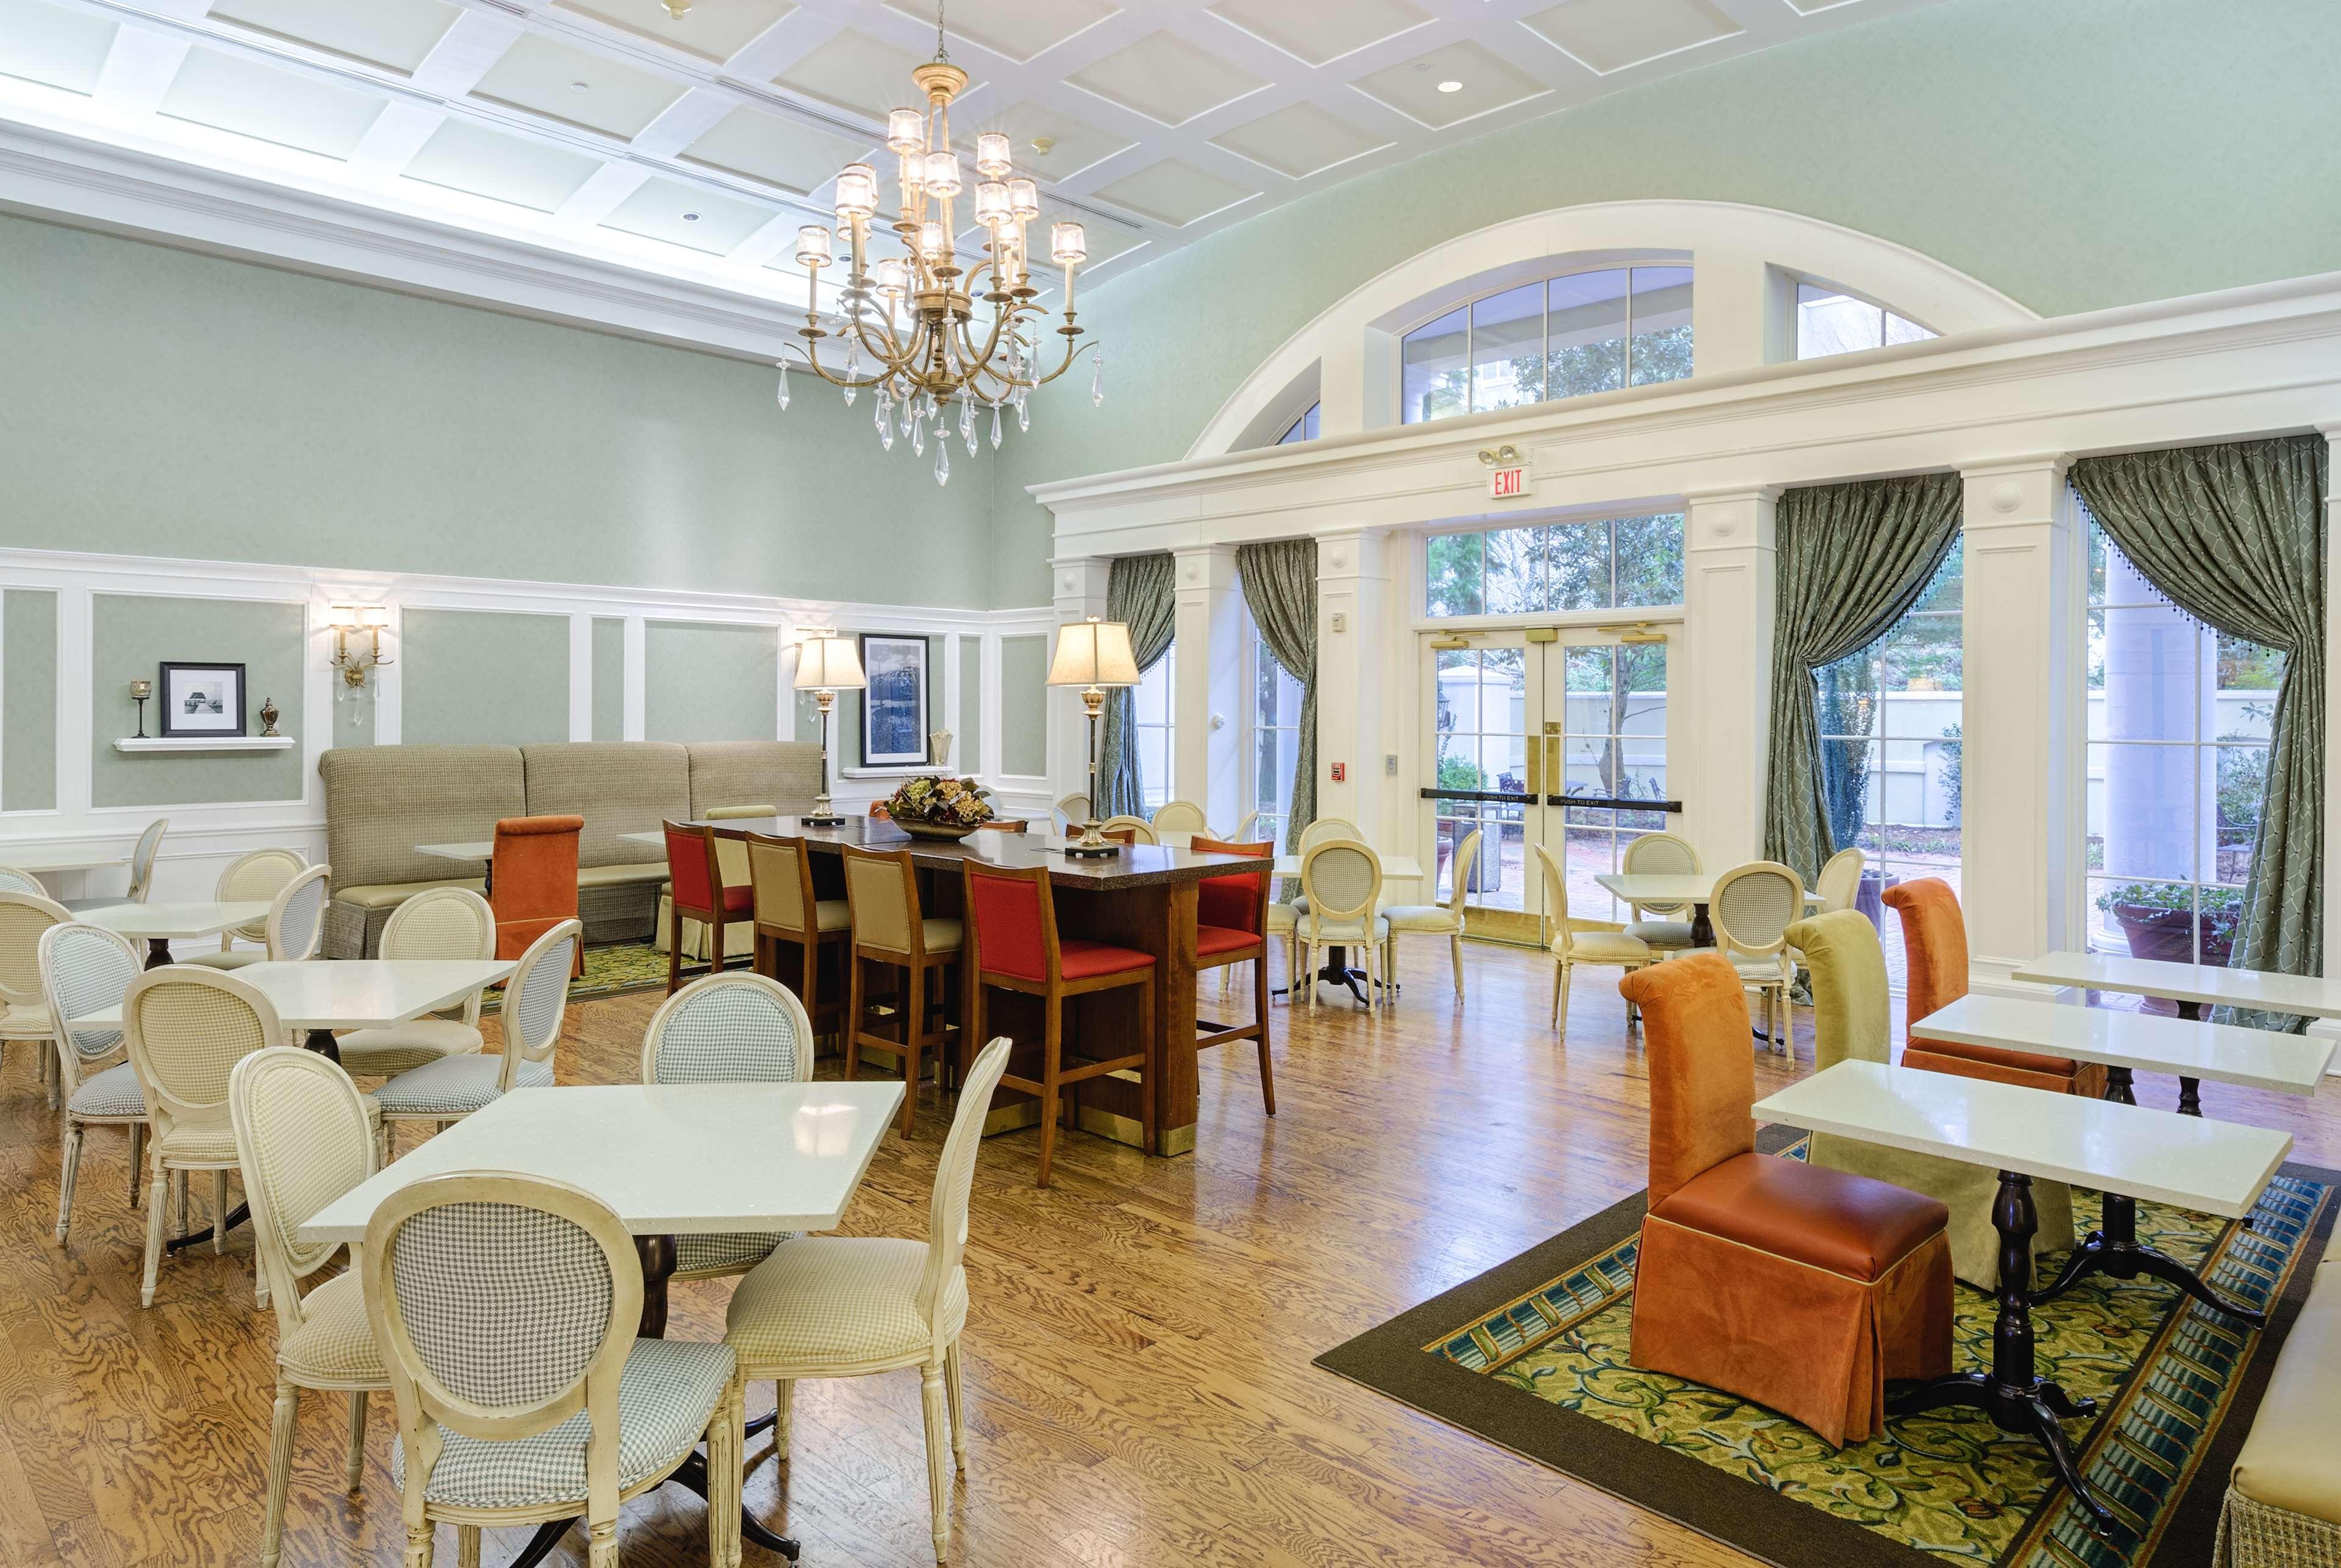 Hampton Inn & Suites Charlotte/South Park at Phillips Place image 10